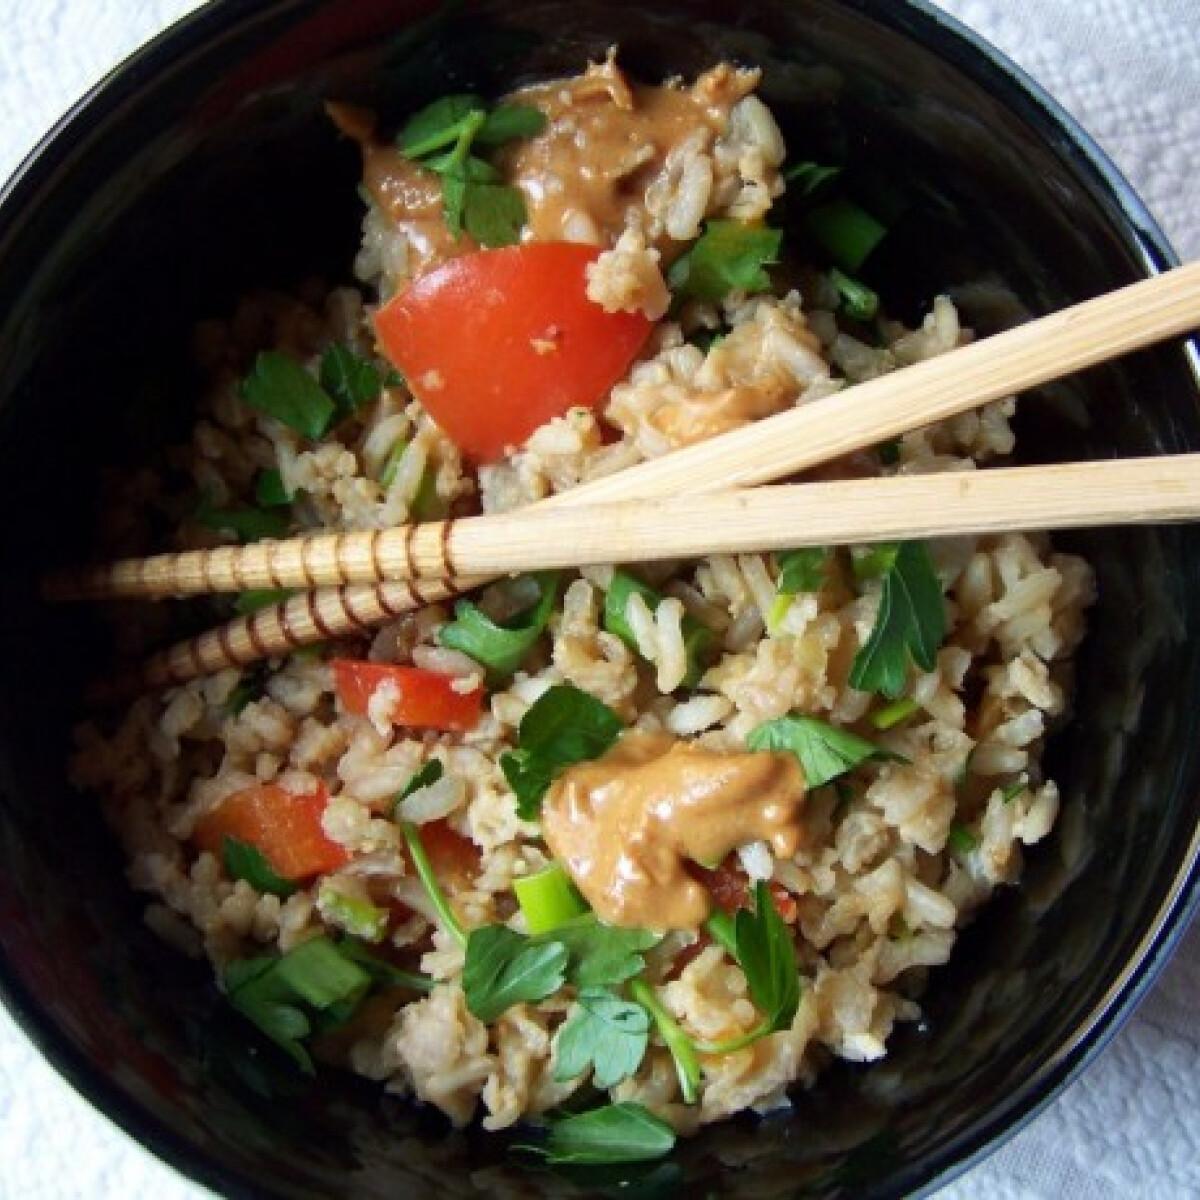 Tojásos barna rizs mogyoróvajjal